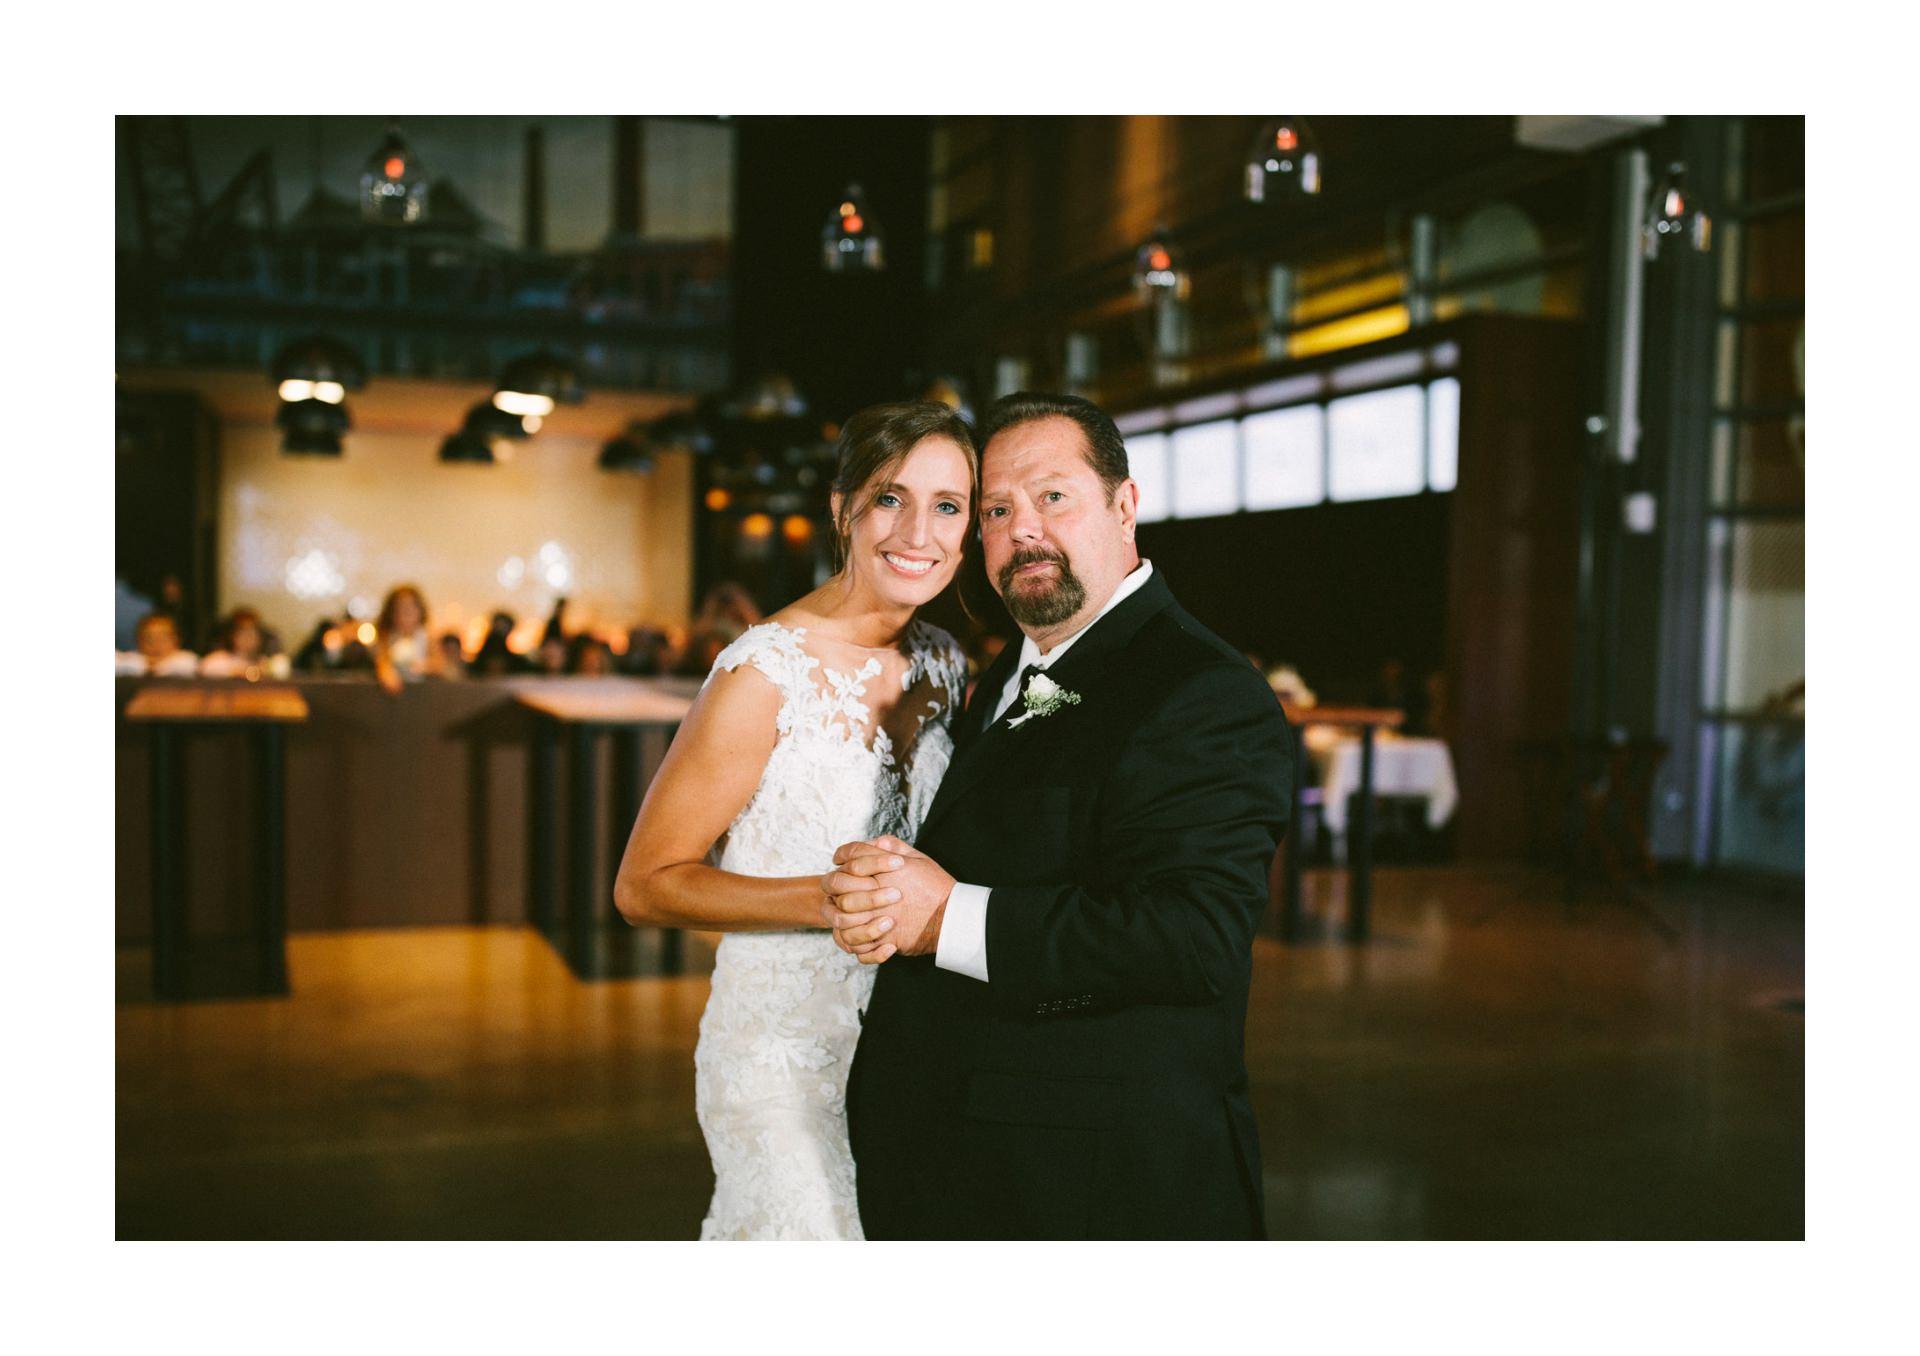 Browns First Energy Stadium Draft Room Wedding Photos 3 19.jpg